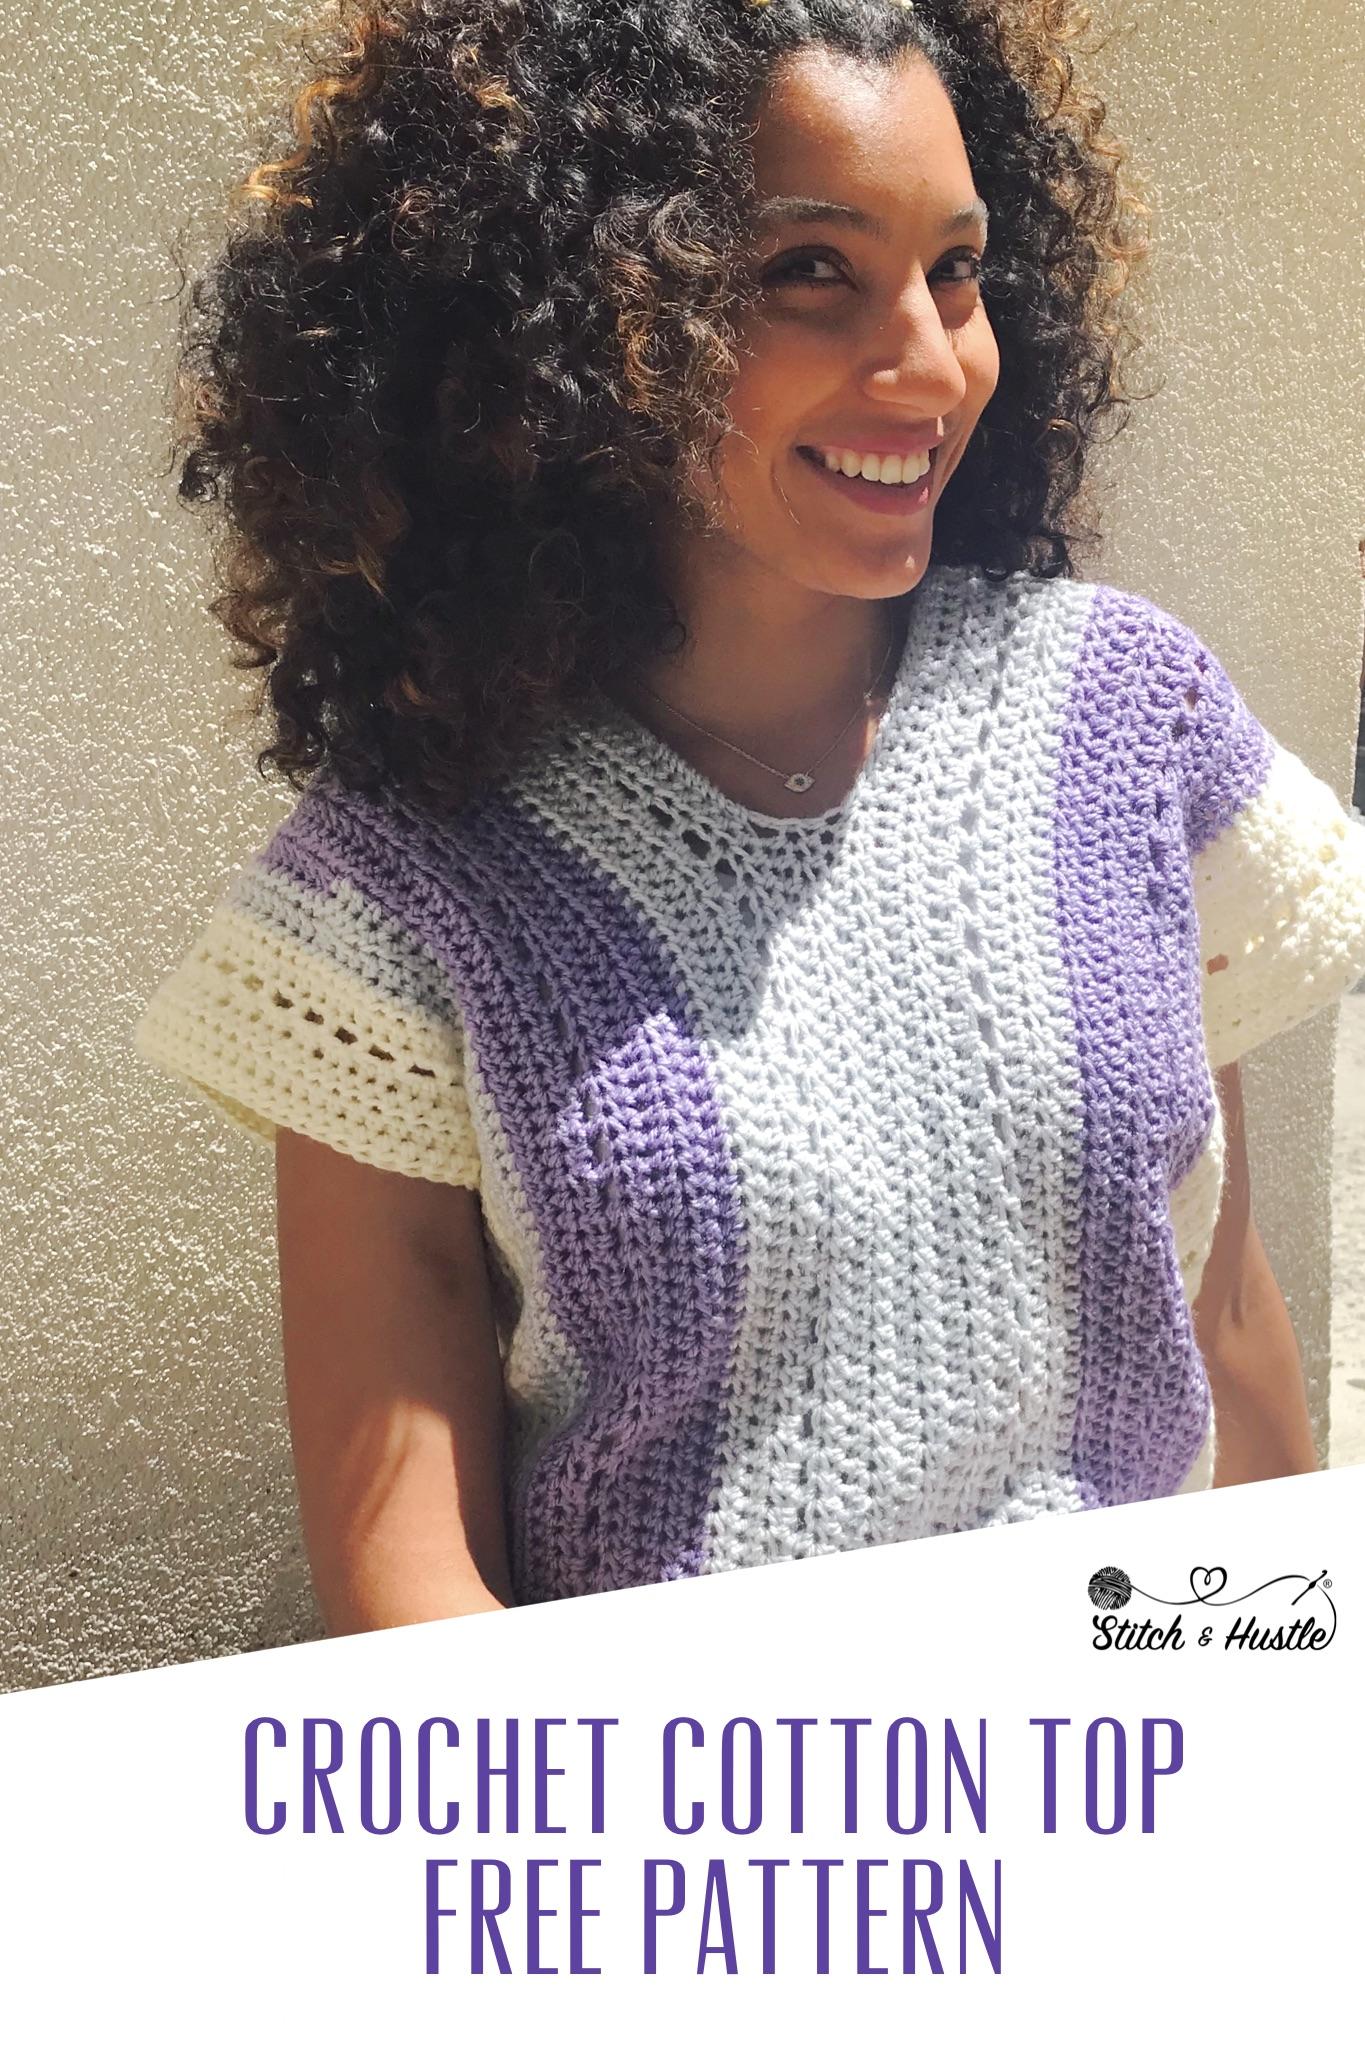 Riviera-crochet-top-free-pattern-stitch-and-hustle-6.jpg